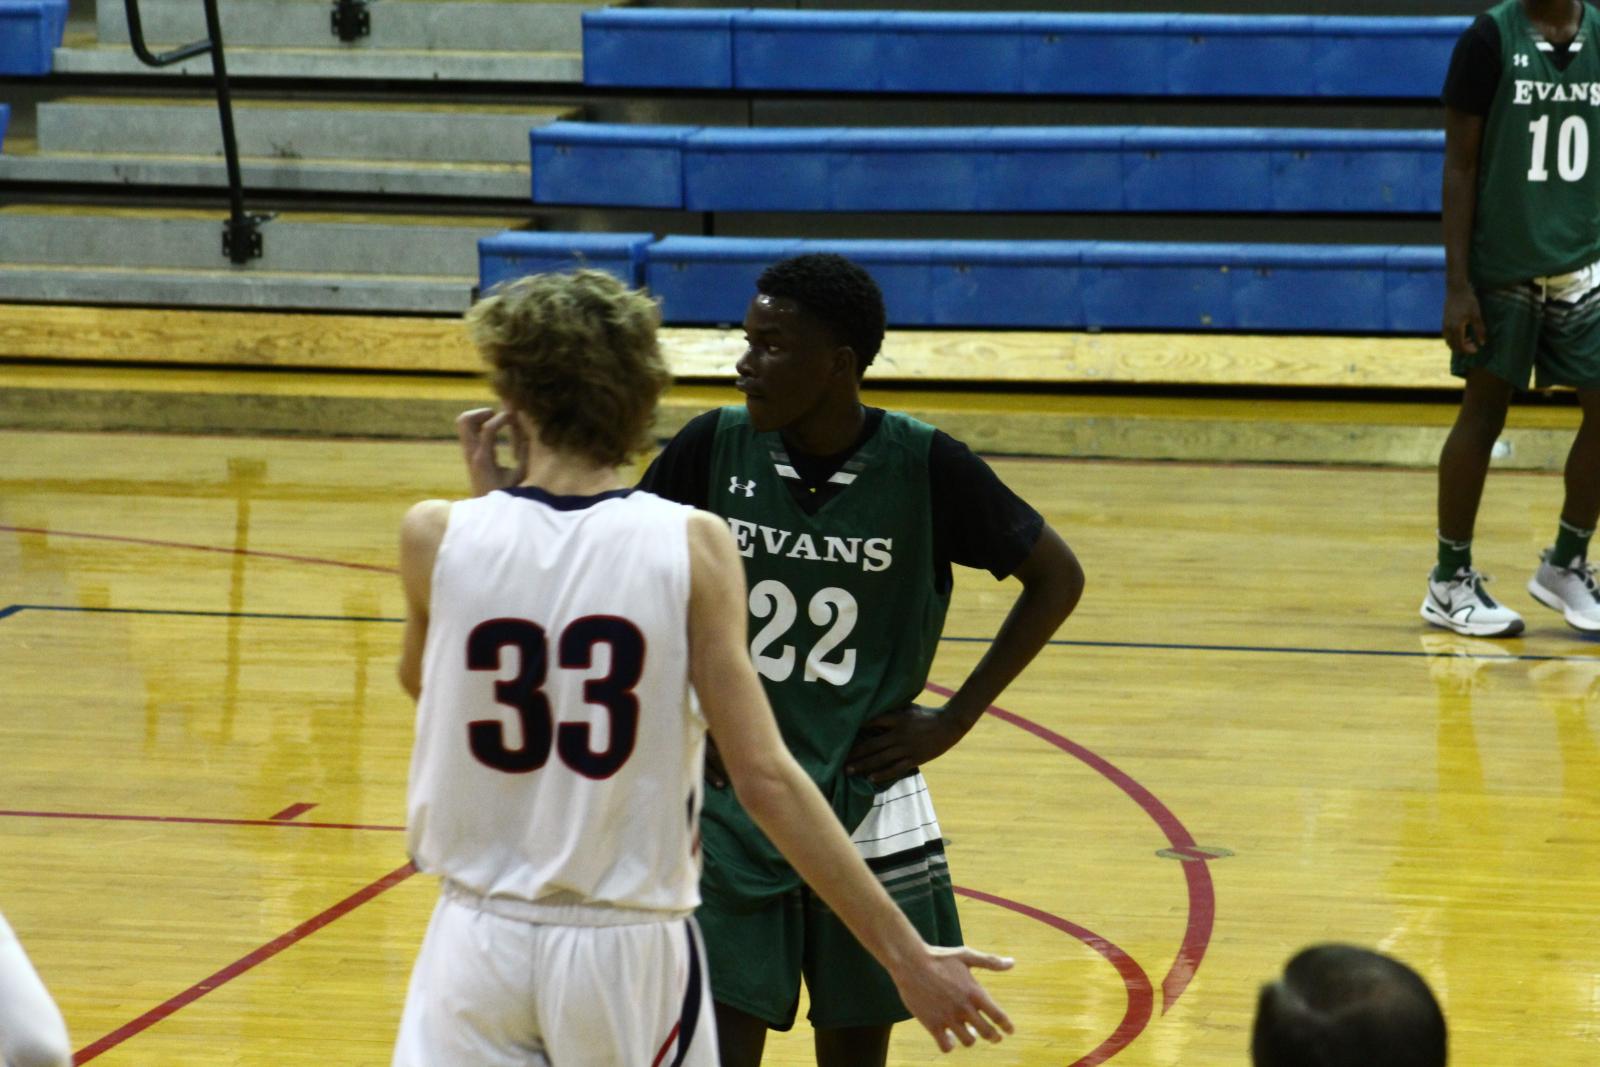 Boys JV Basketball vs. Lake Brantley [Jan. 6, 2021]